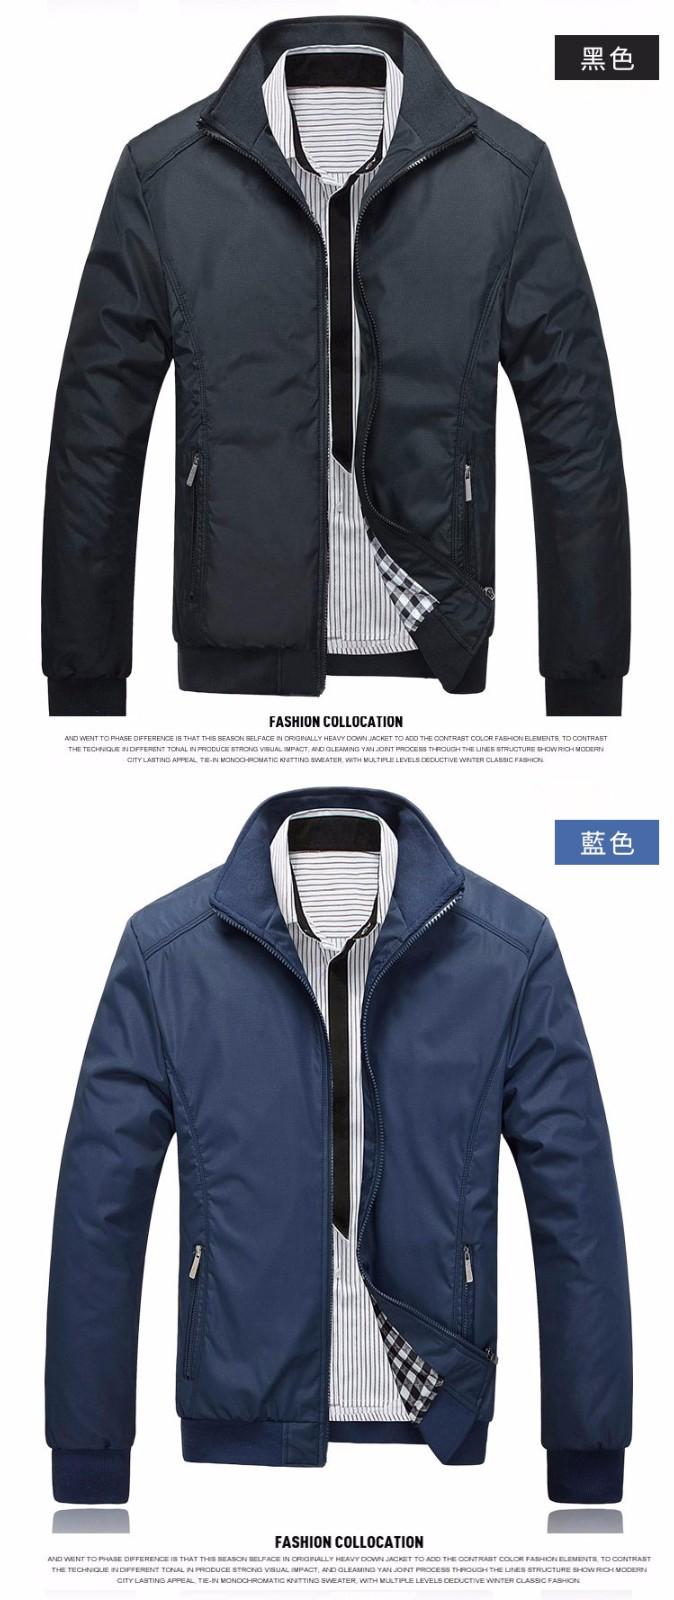 Jason Wolf夾克黑色與藍色正面特寫